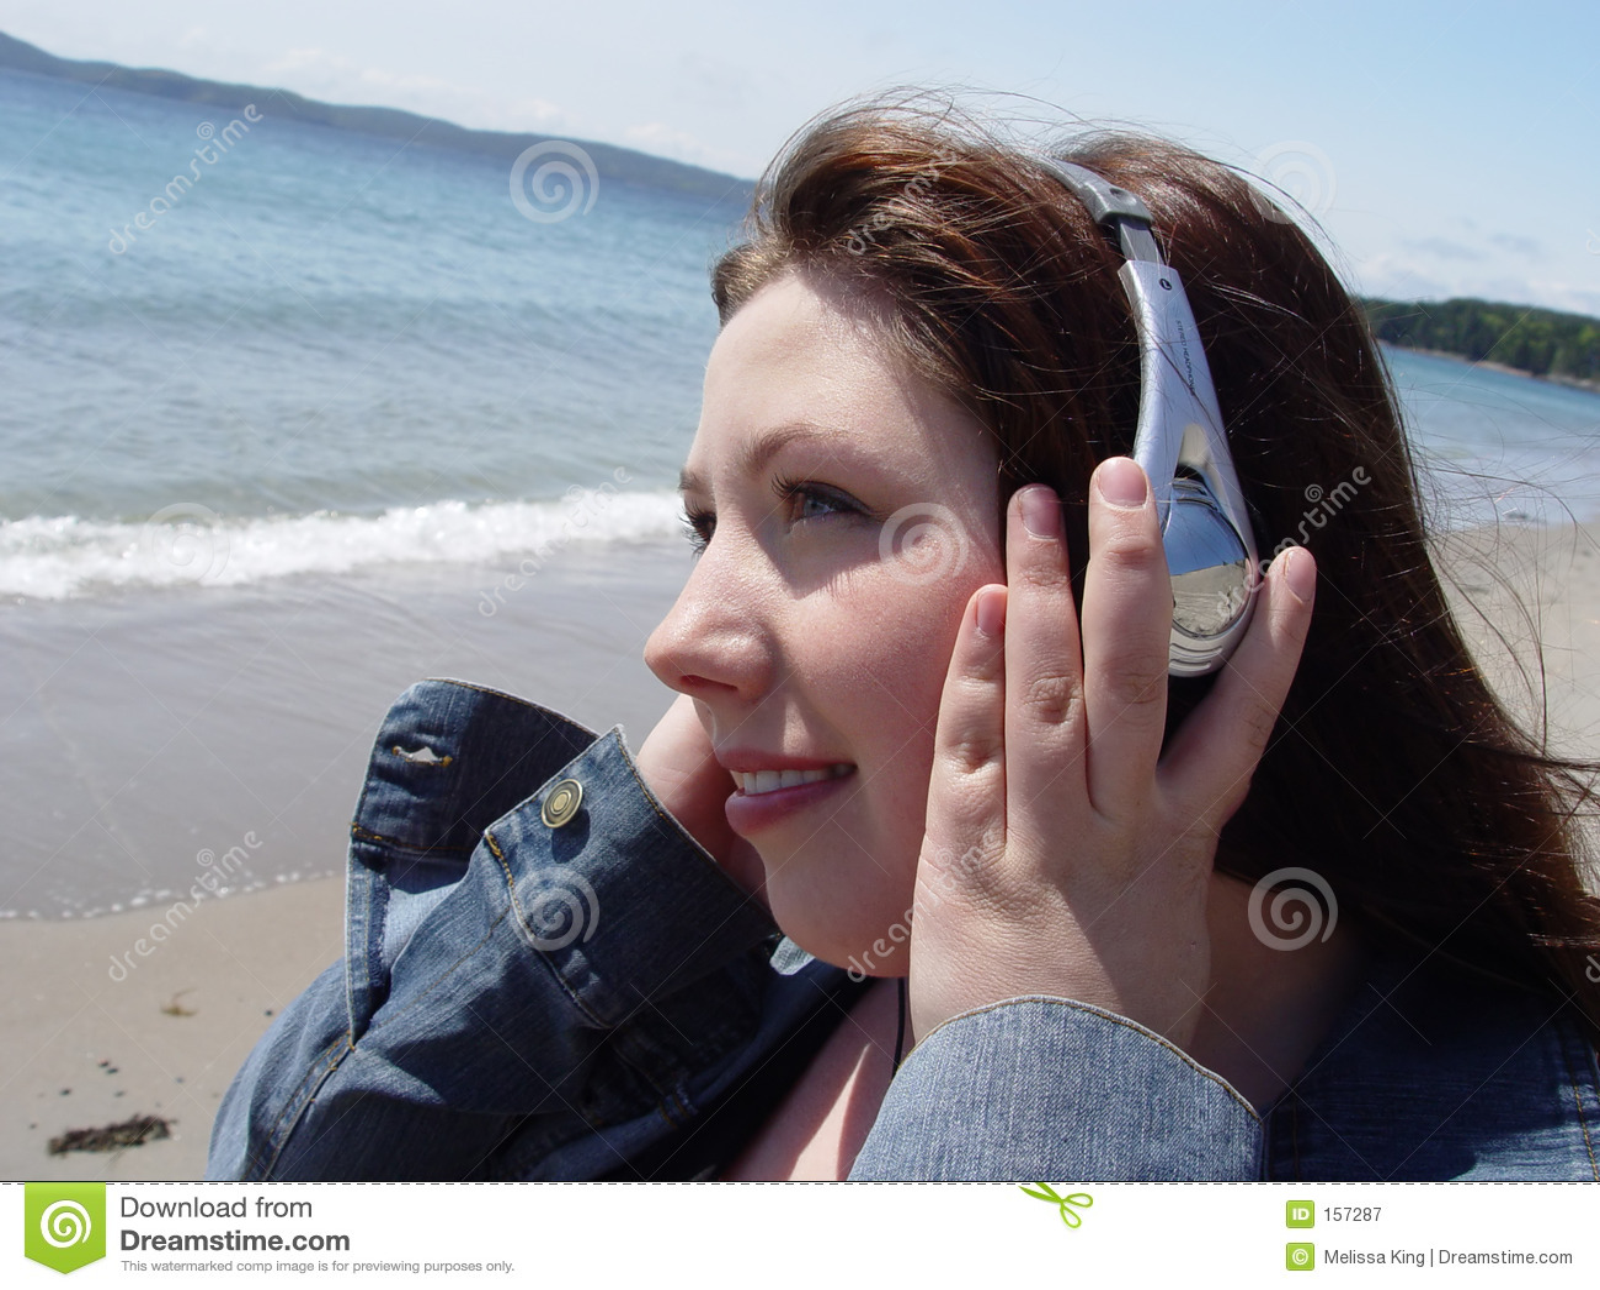 Woman in headphones on beach